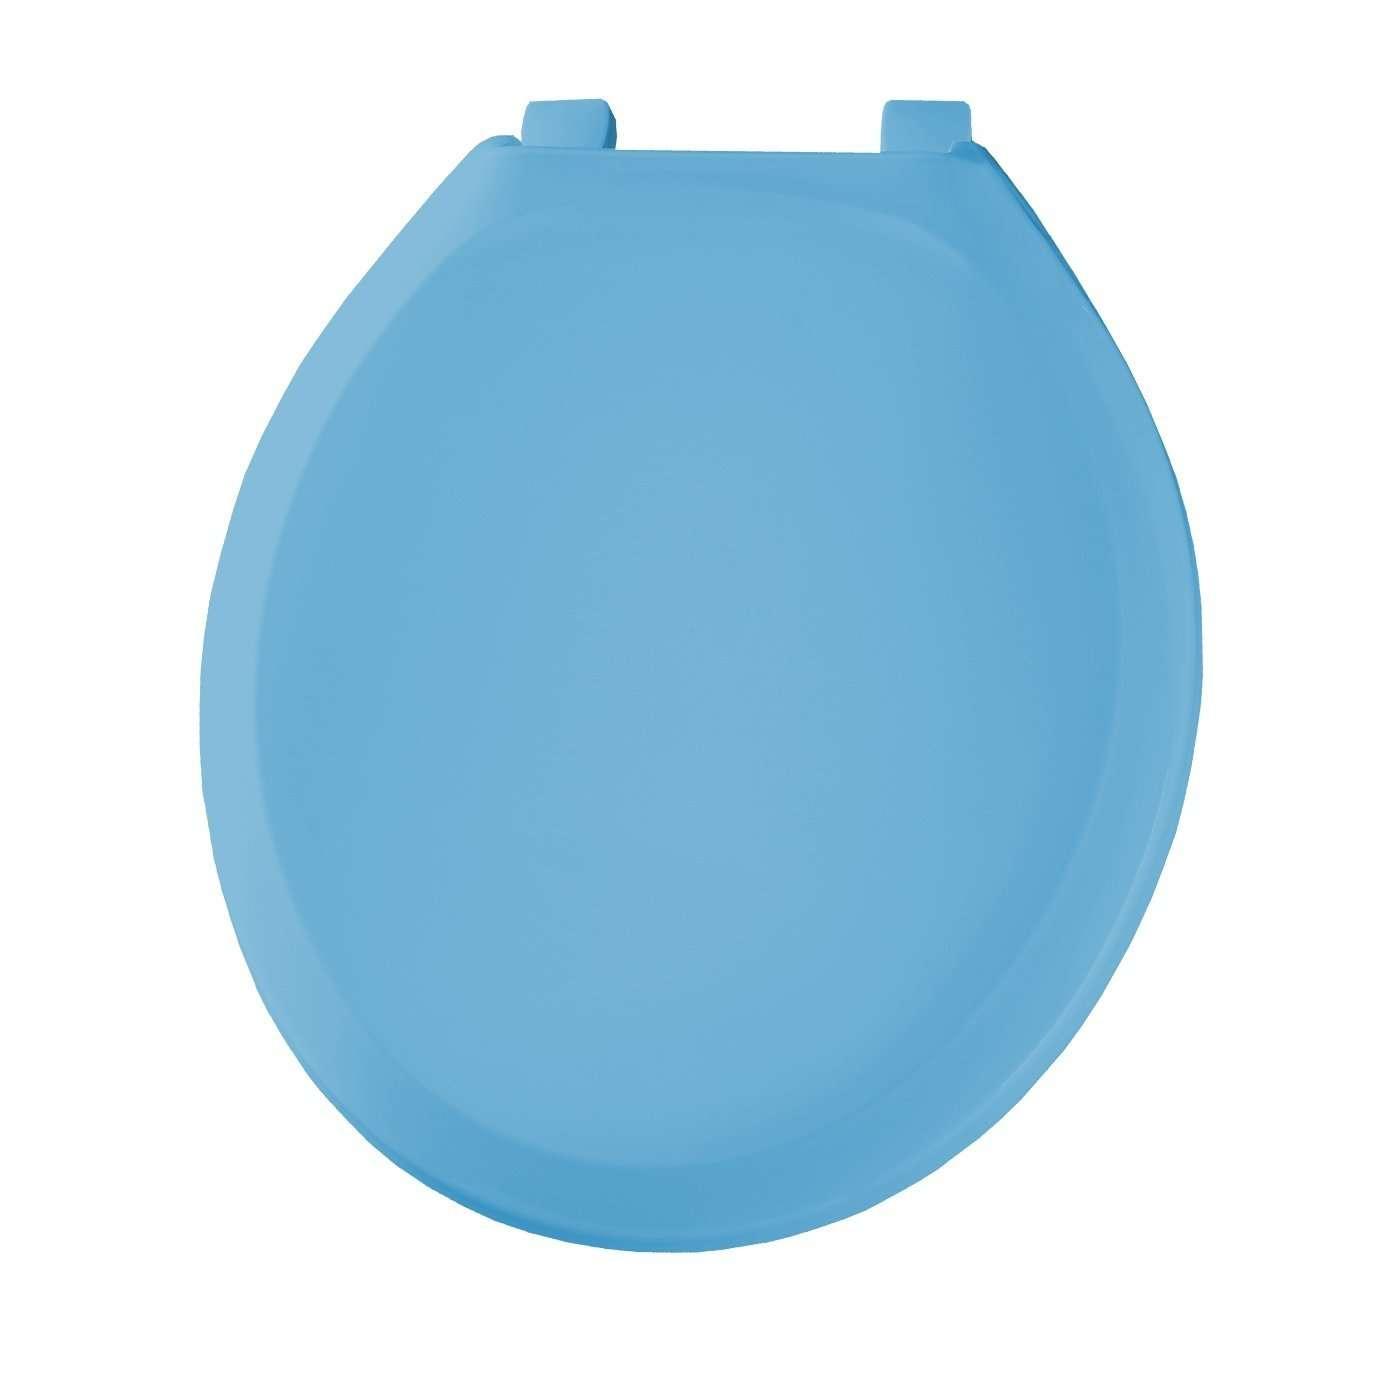 Church Bemis 200TC144 Plastic Round Toilet Seat New Orleans Blue EBay